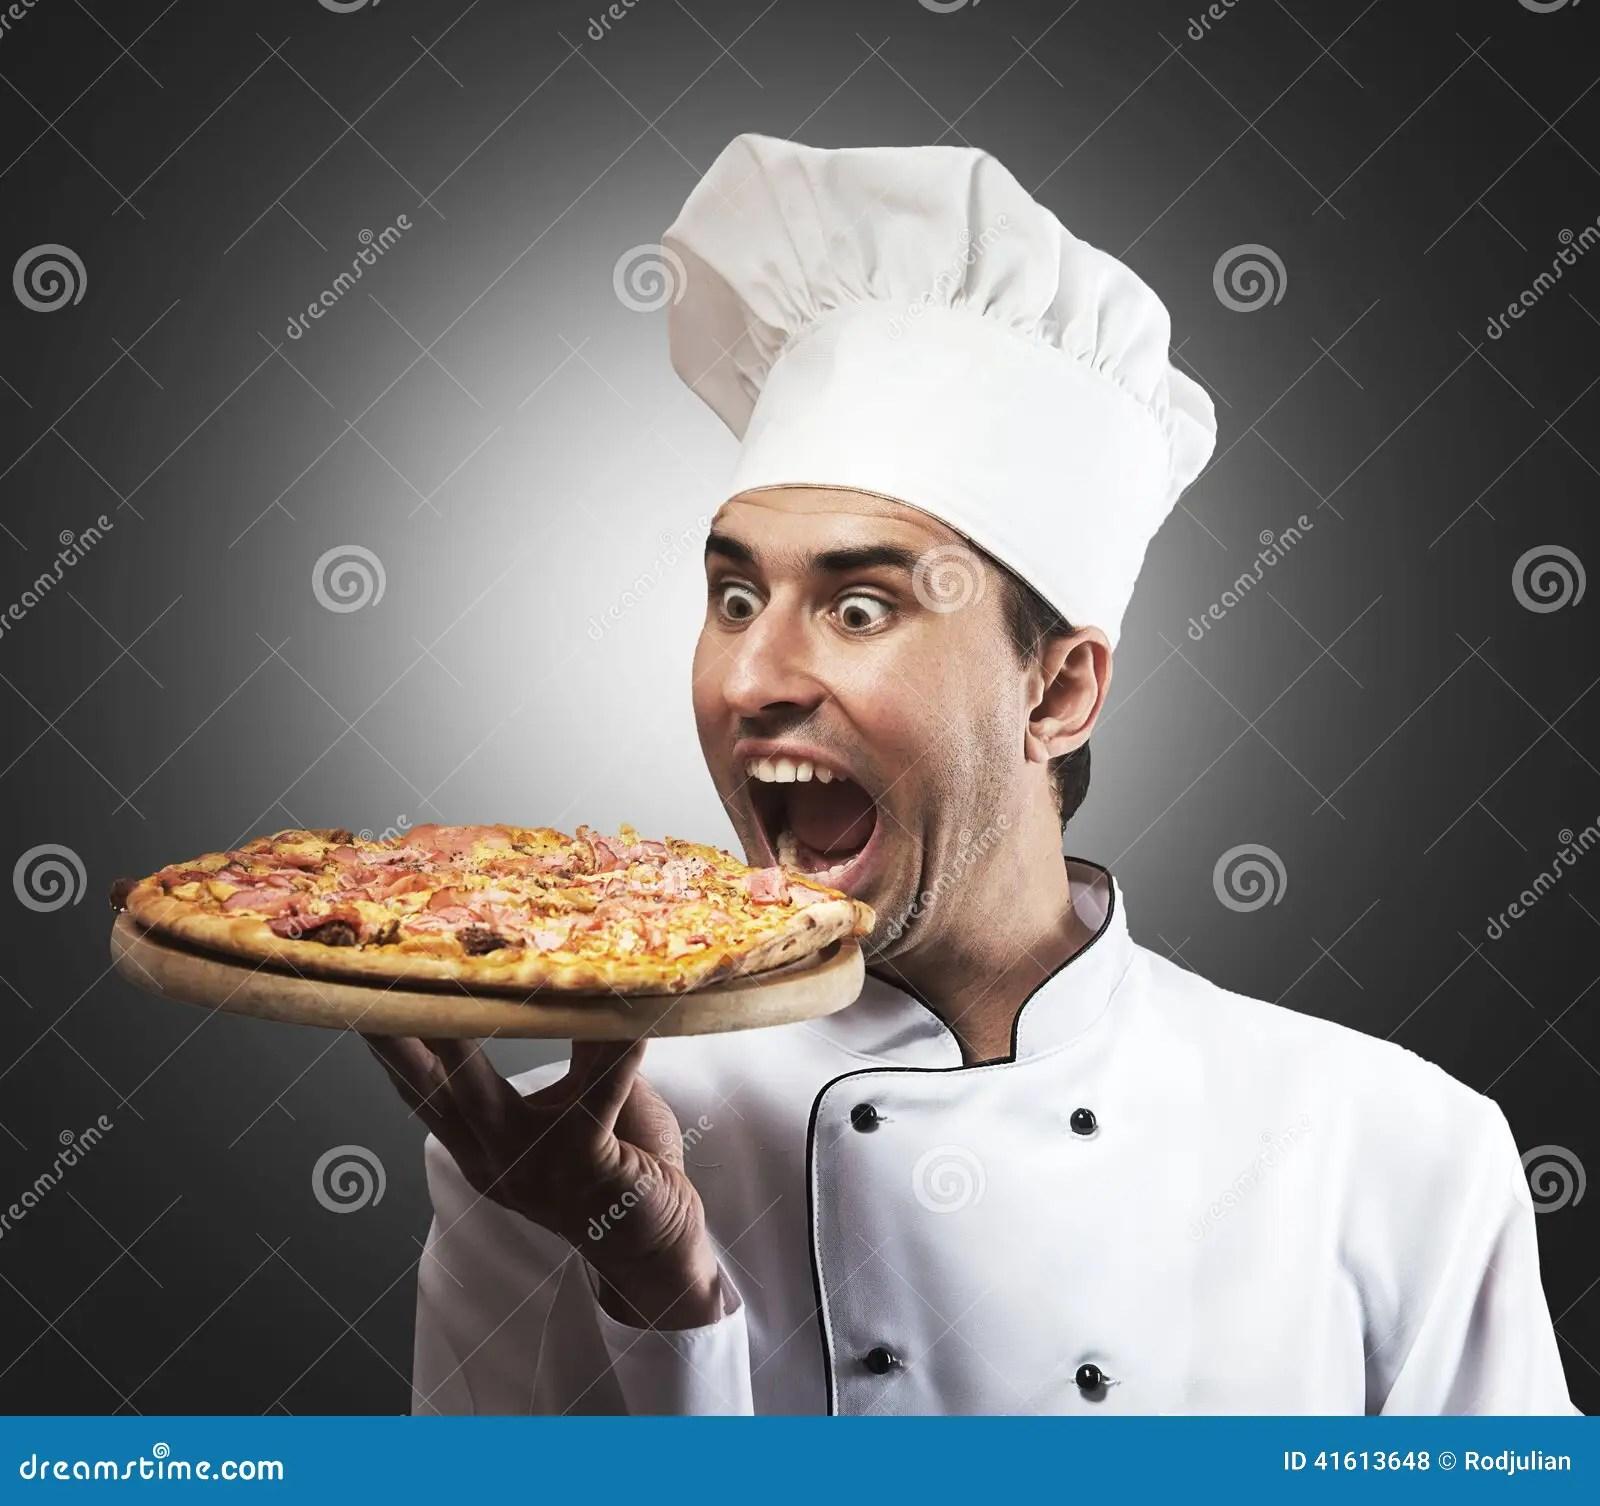 Funny Pizza Chef Stock Photo  Image 41613648